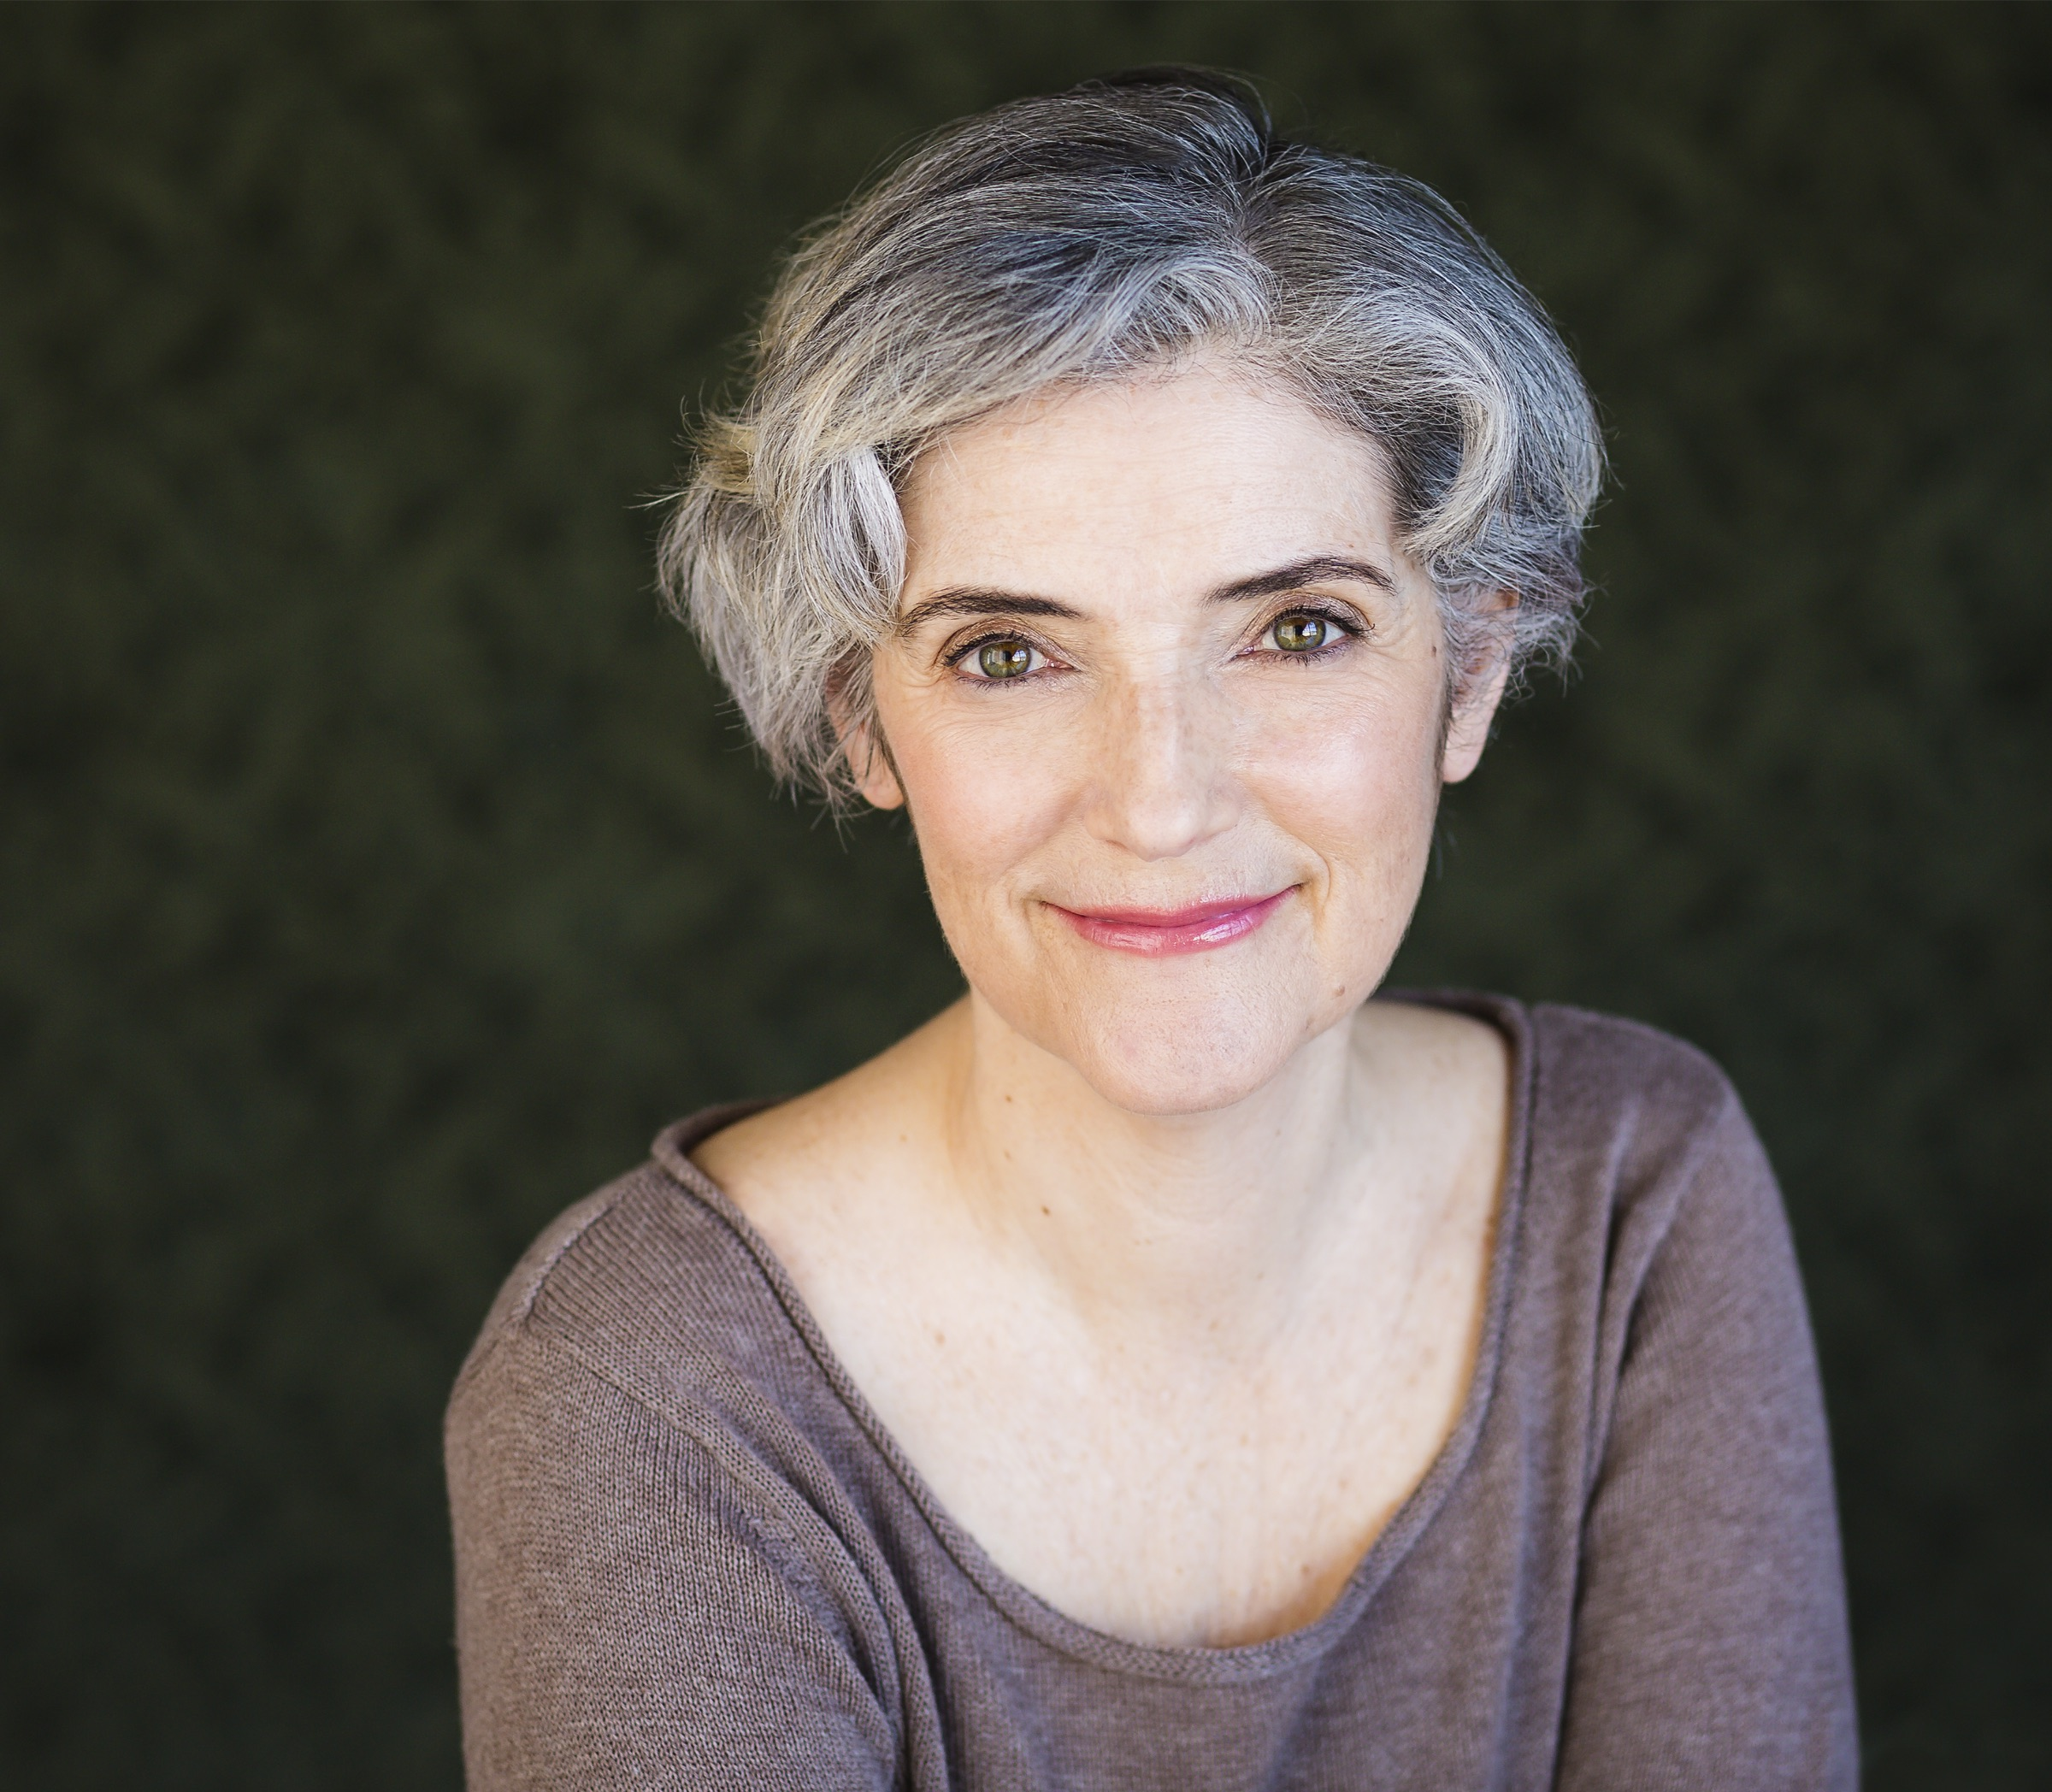 Denise Norman